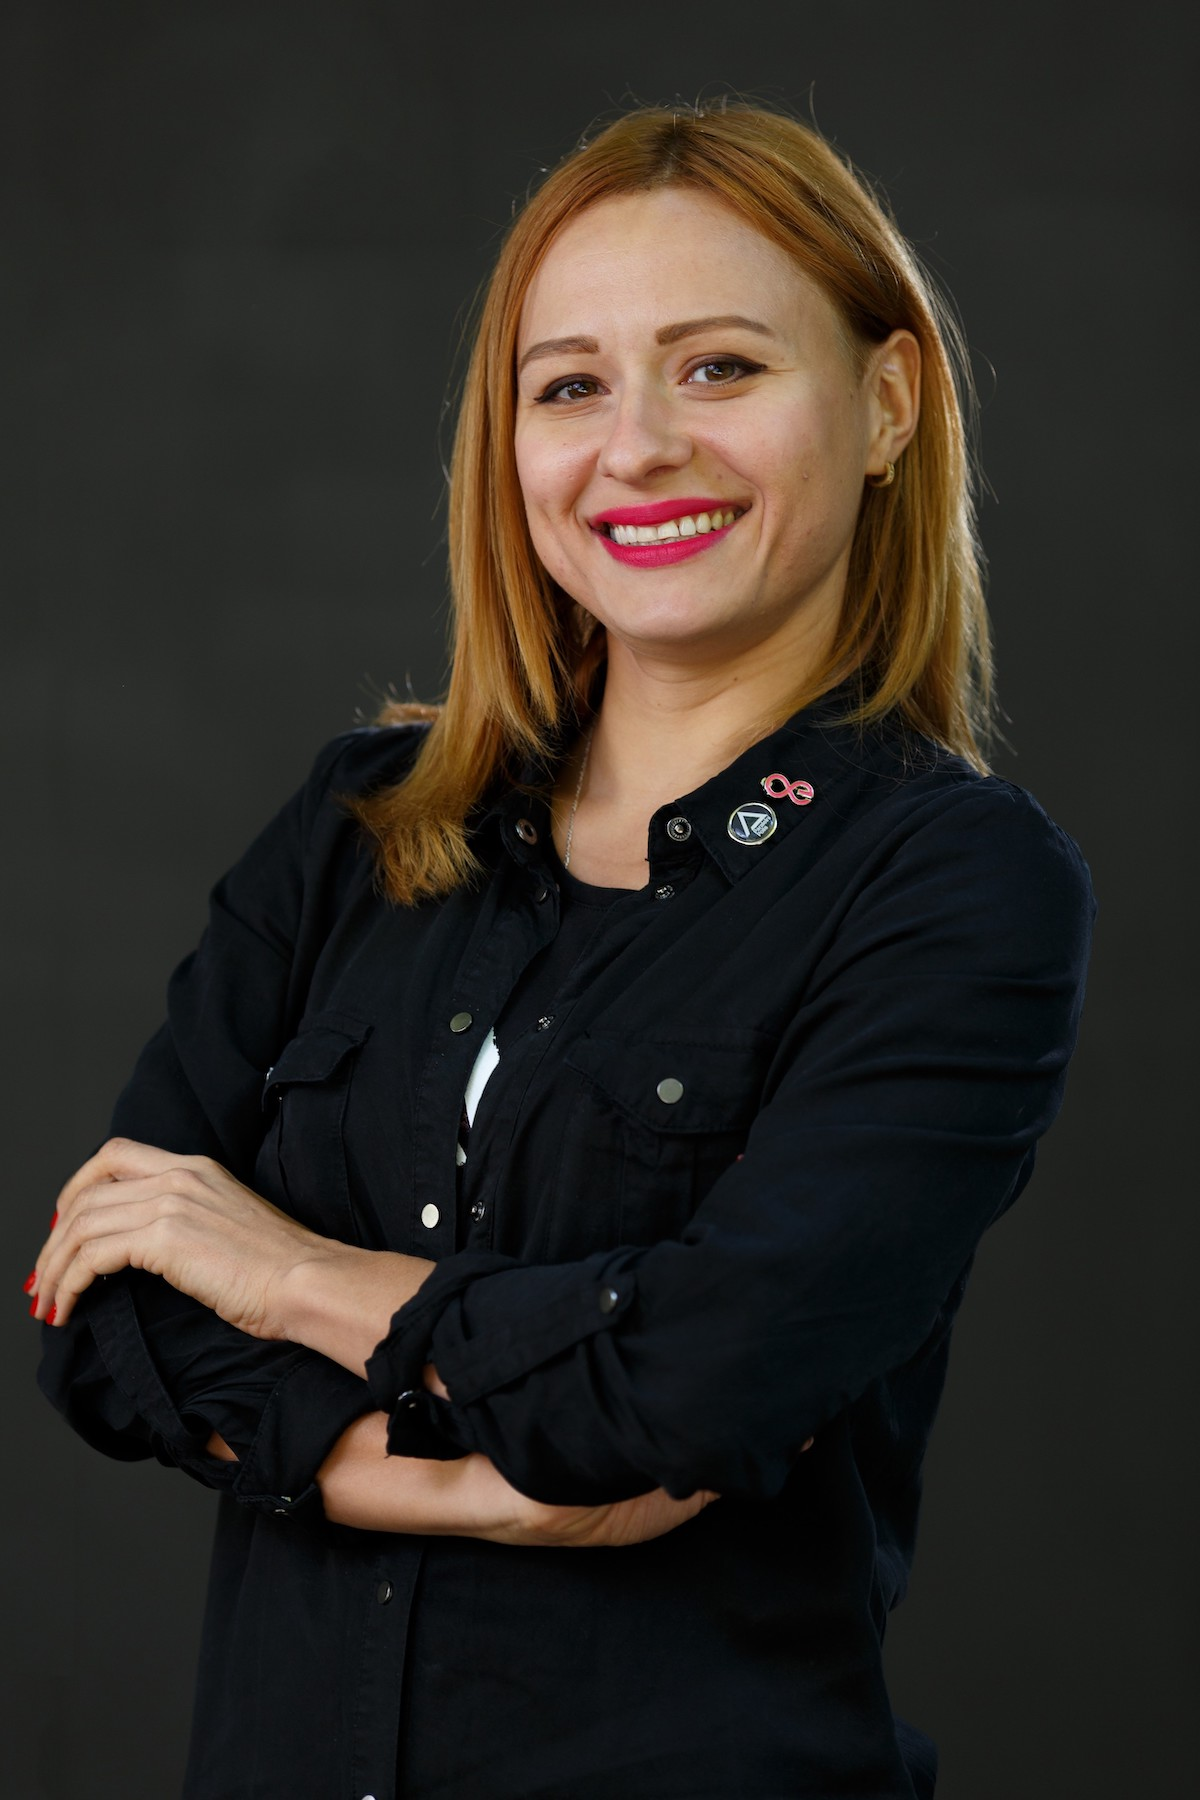 Maya Bersheva